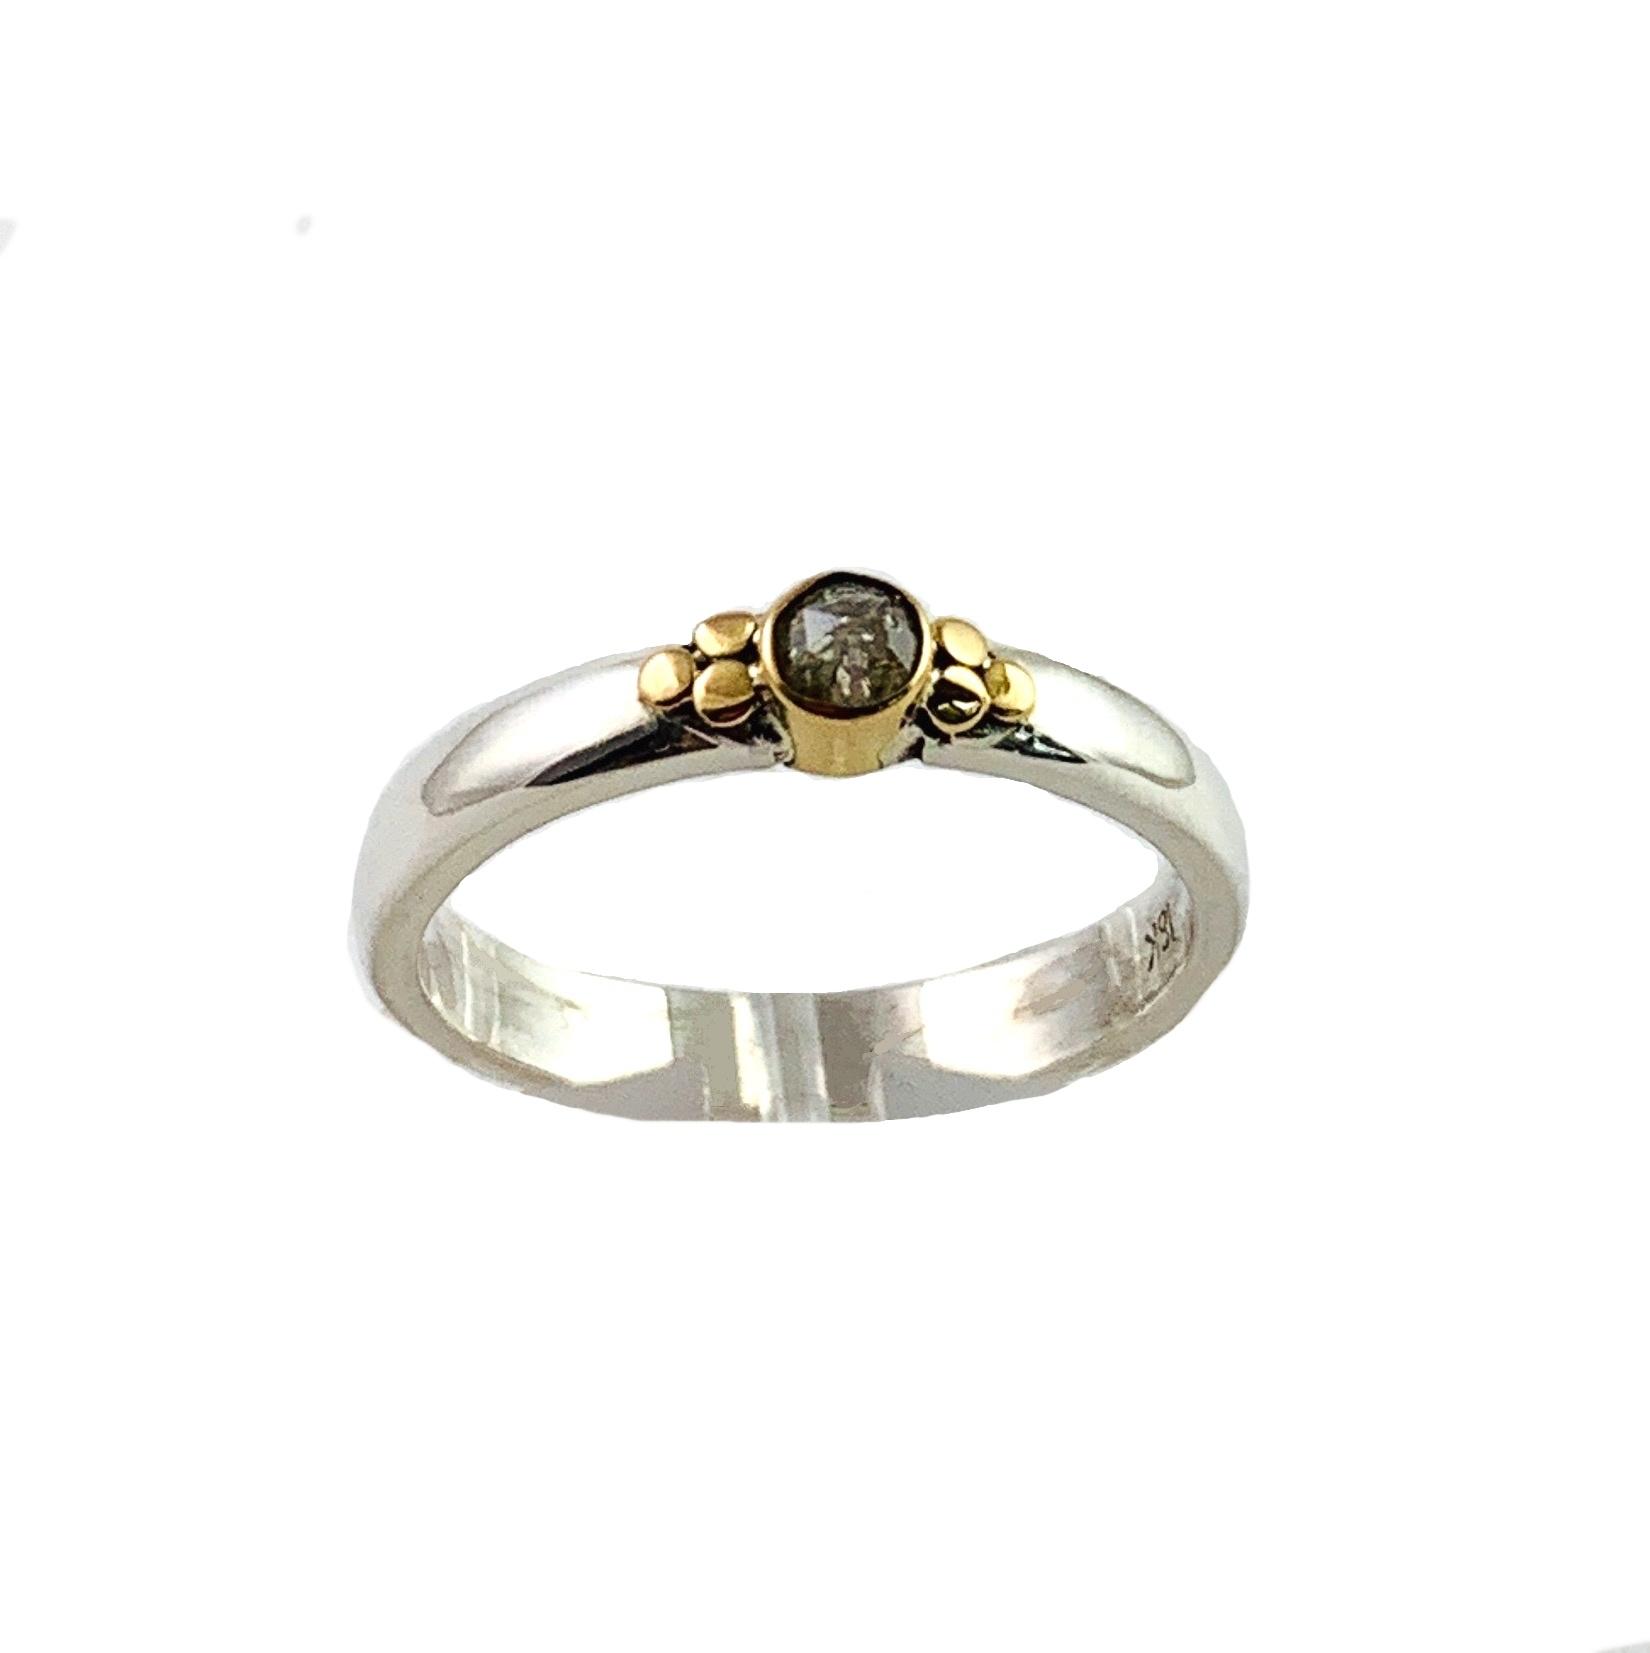 Kiliaan collectie Ring rose cut diamond, pepper and salt